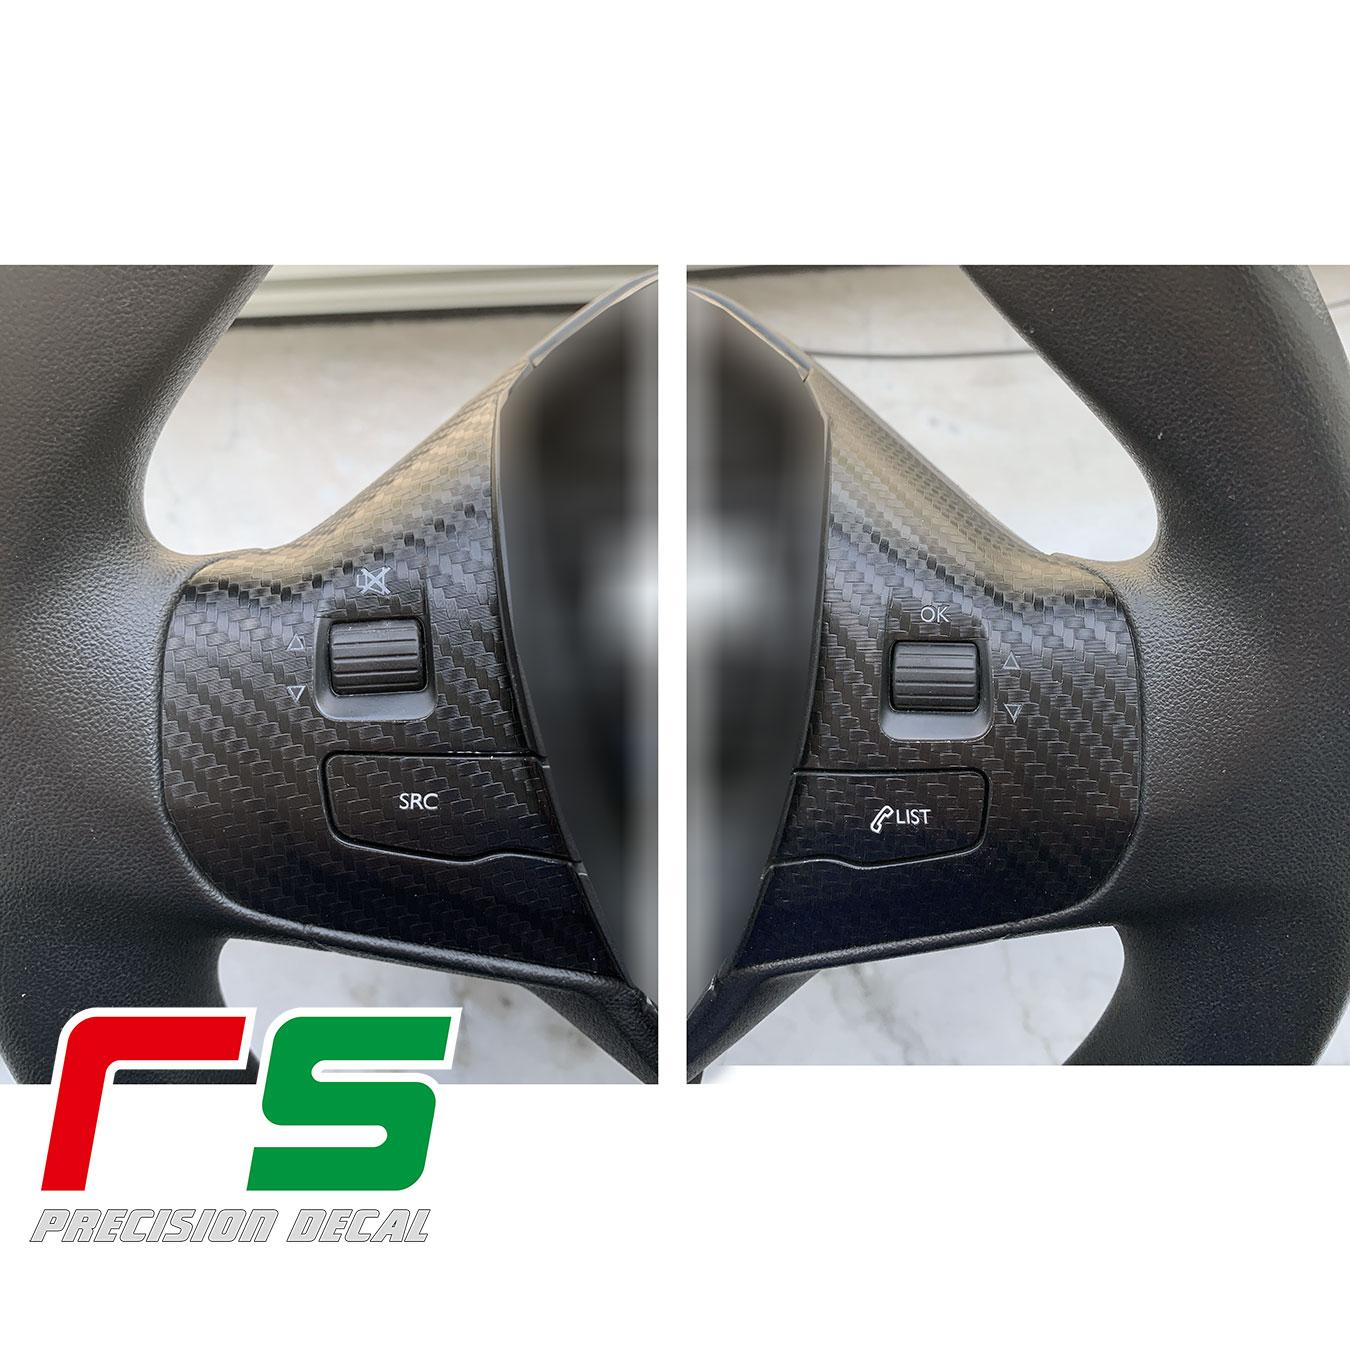 Peugeot 208 adesivi comandi al volante Decal carbonlook